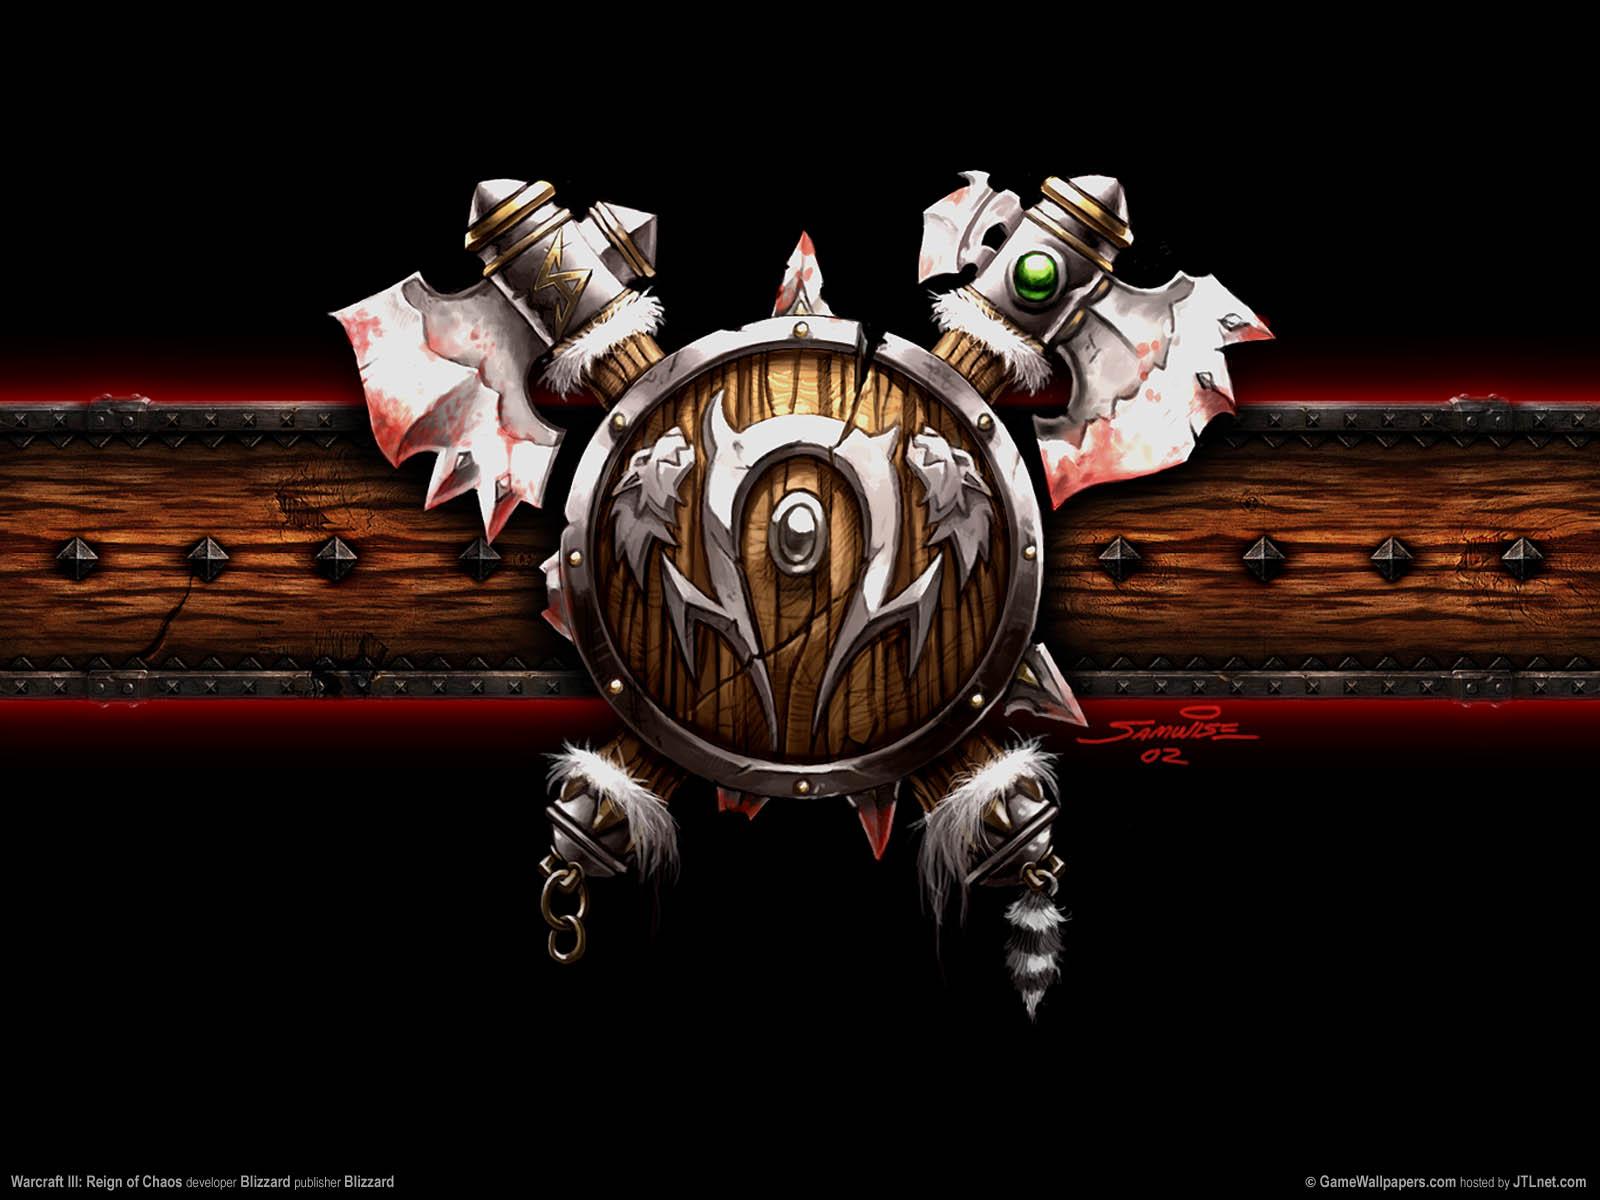 Warcraft 3: Reign of Chaos Hintergrundbild 06 1600x1200